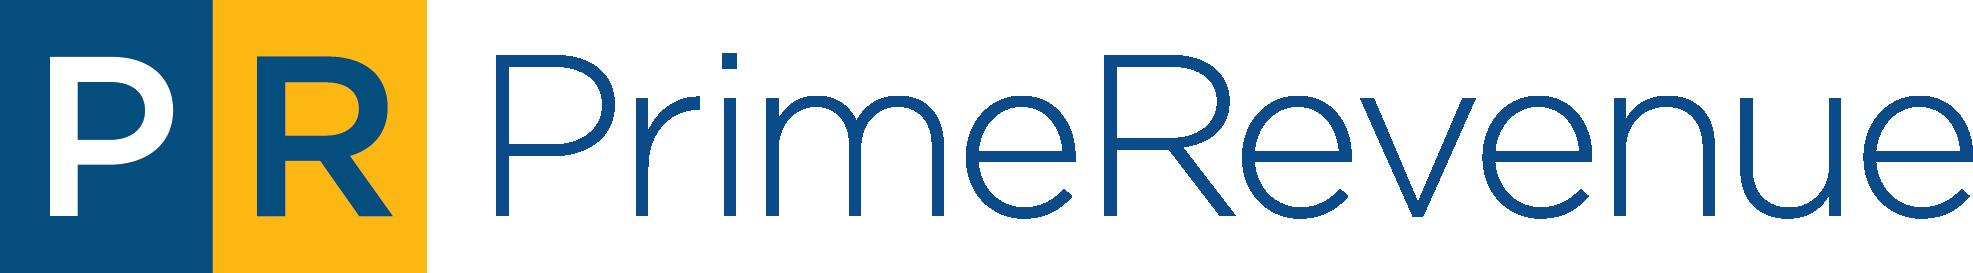 PrimeRevenue, Inc. Company Logo